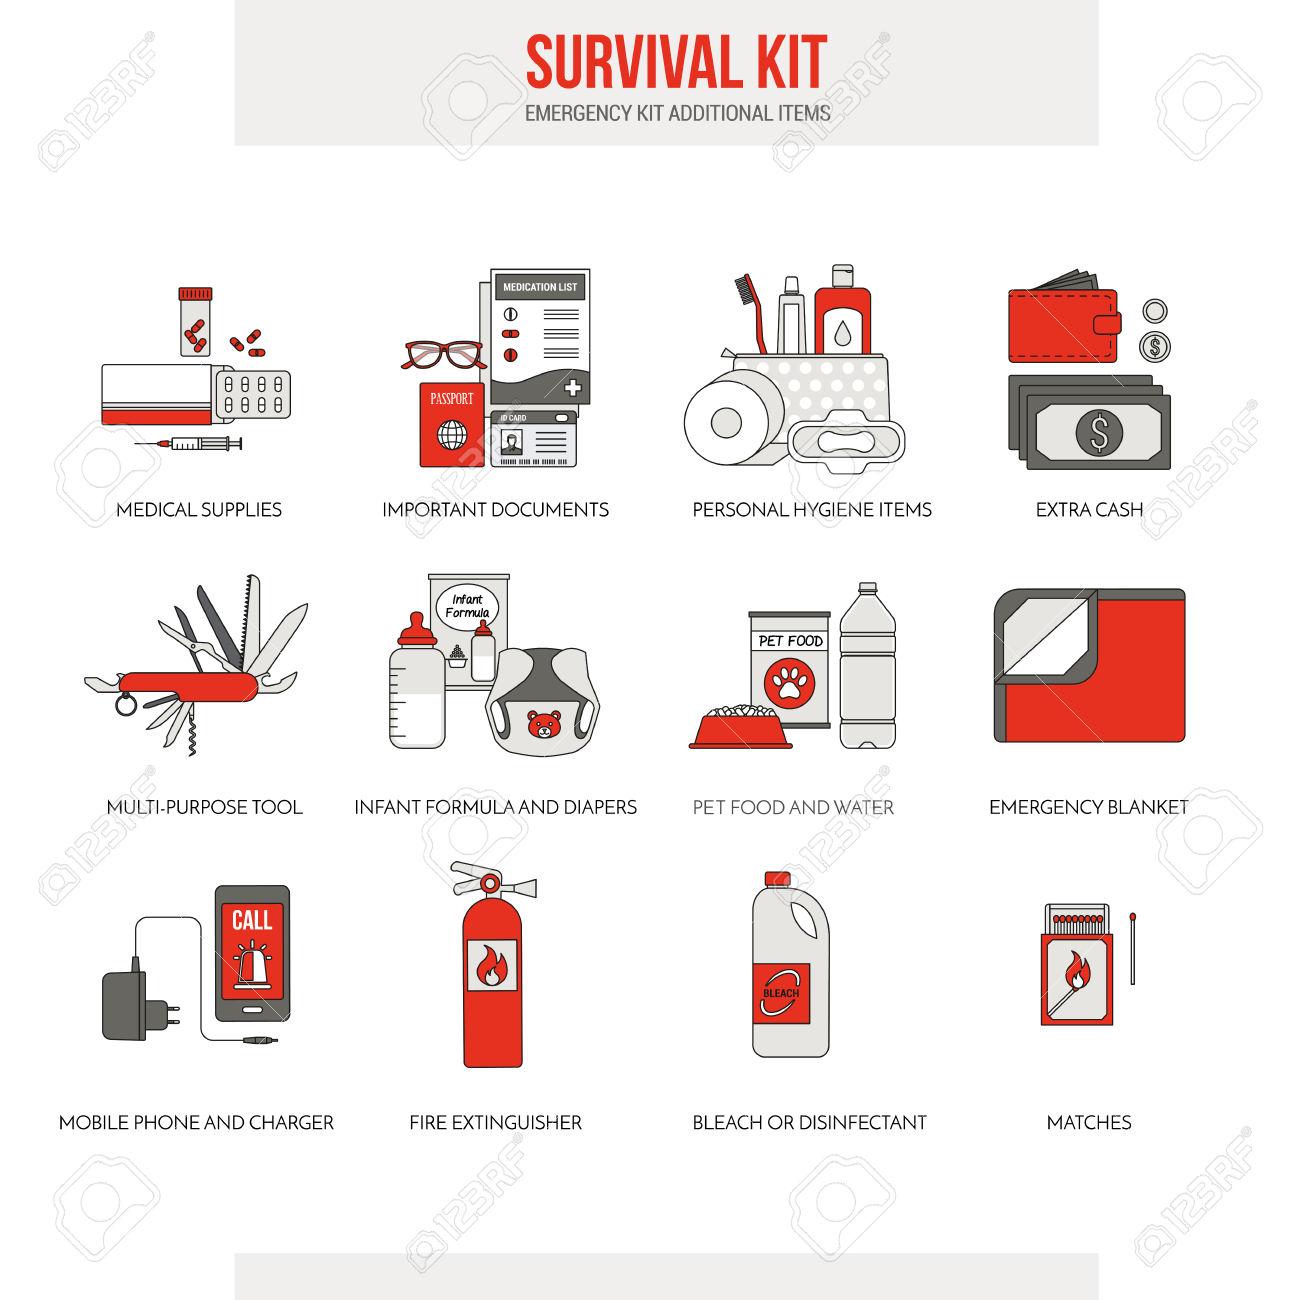 Blanket clipart icon. Emergency hygiene kit pencil